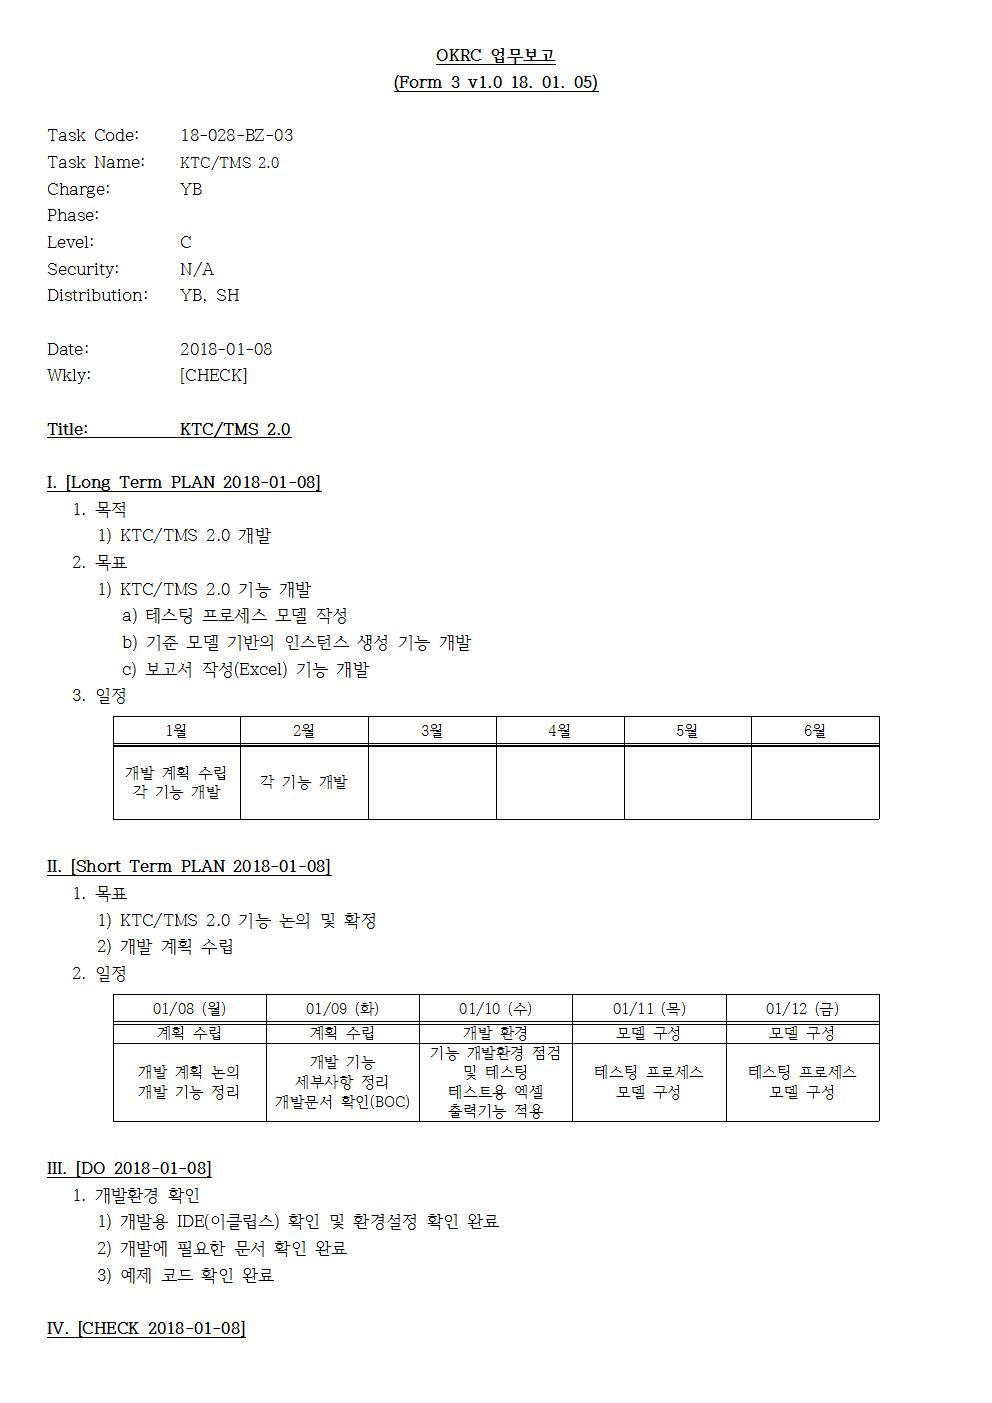 D-[18-028-BZ-03]-[KTC TMS]-[2018-01-12][YB]001.jpg